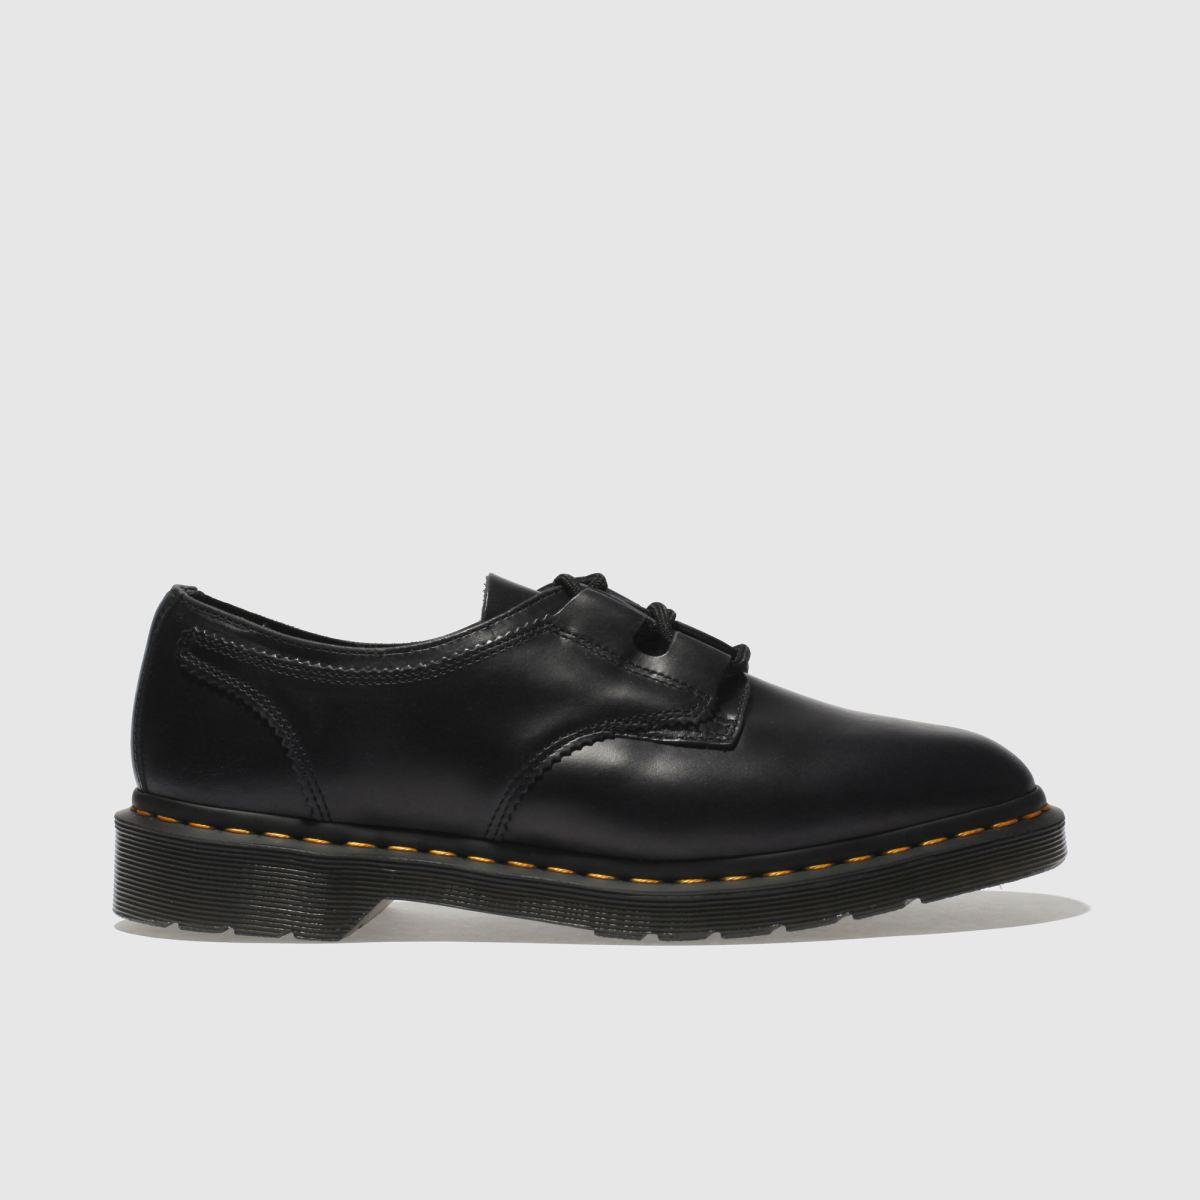 Dr Martens Navy 1461 Ghillie Aqua Glide Shoes